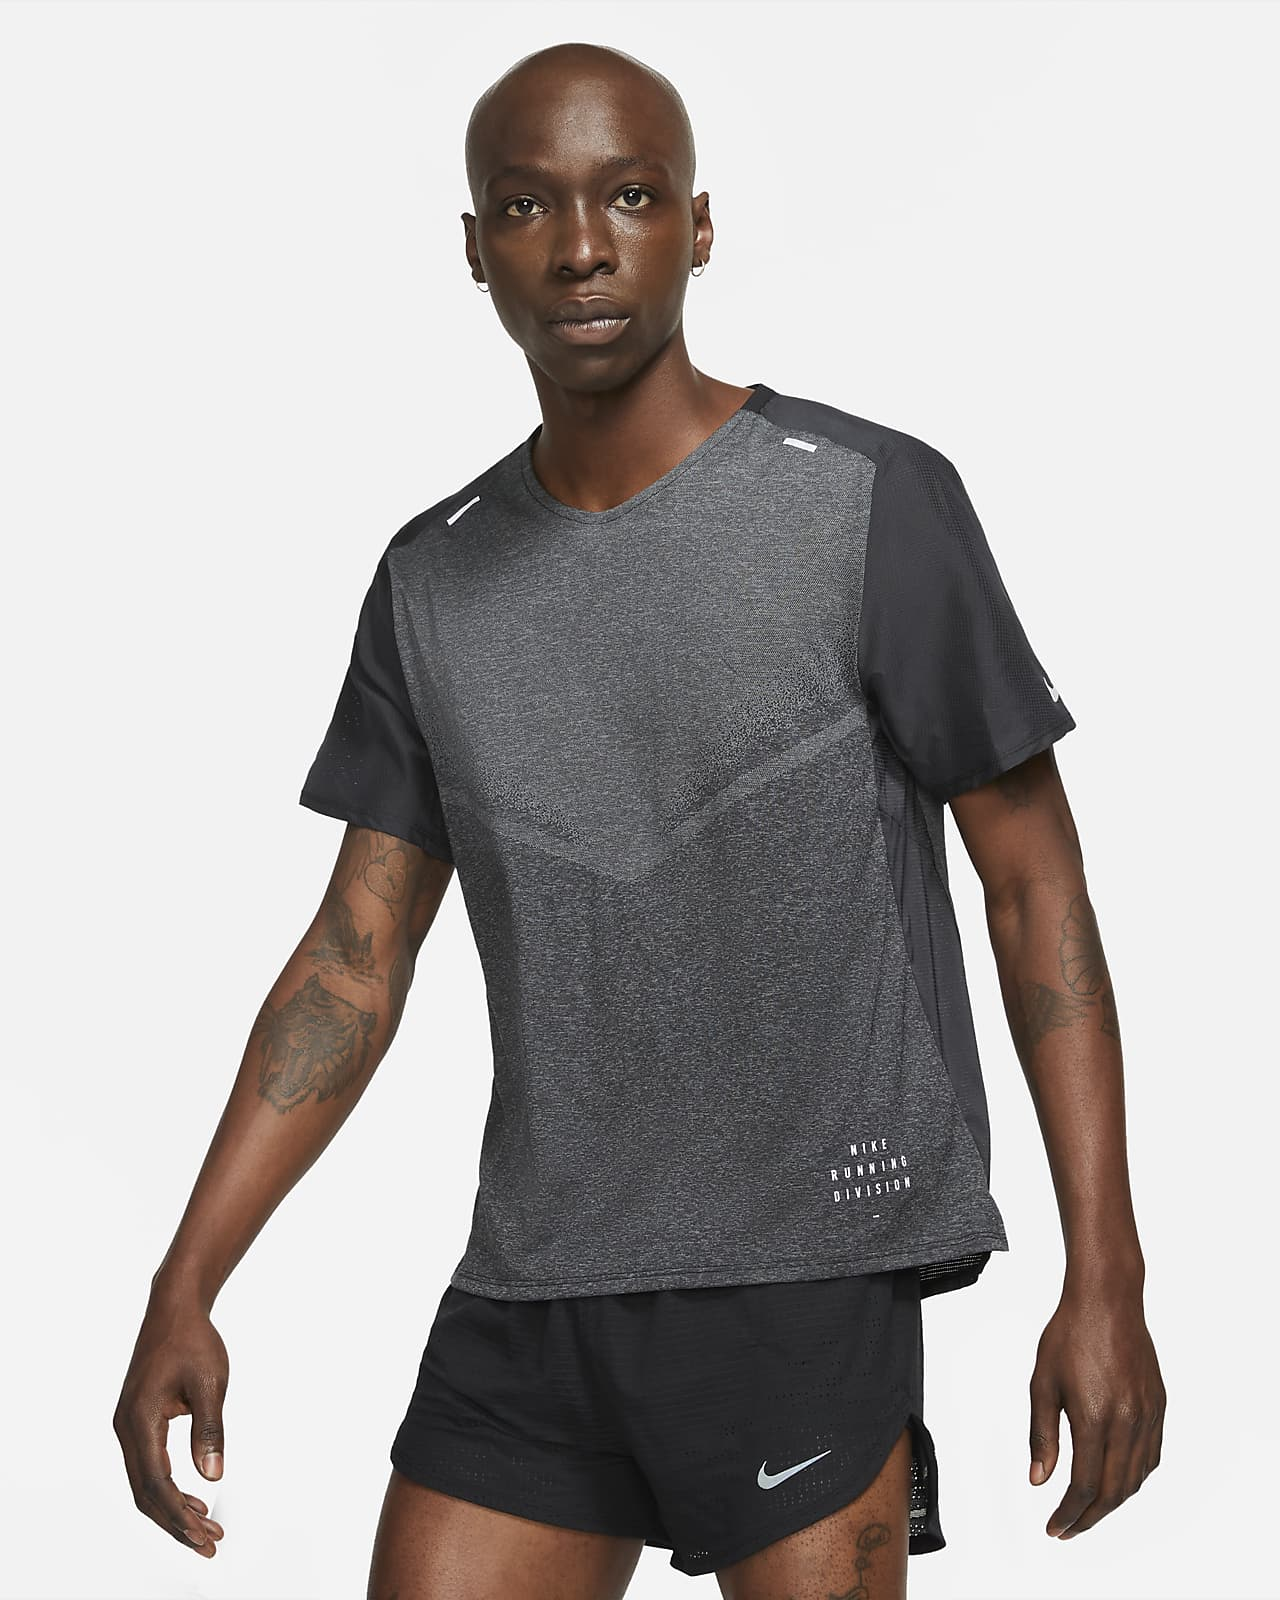 Nike Techknit Ultra Run Division 男款短袖跑步上衣